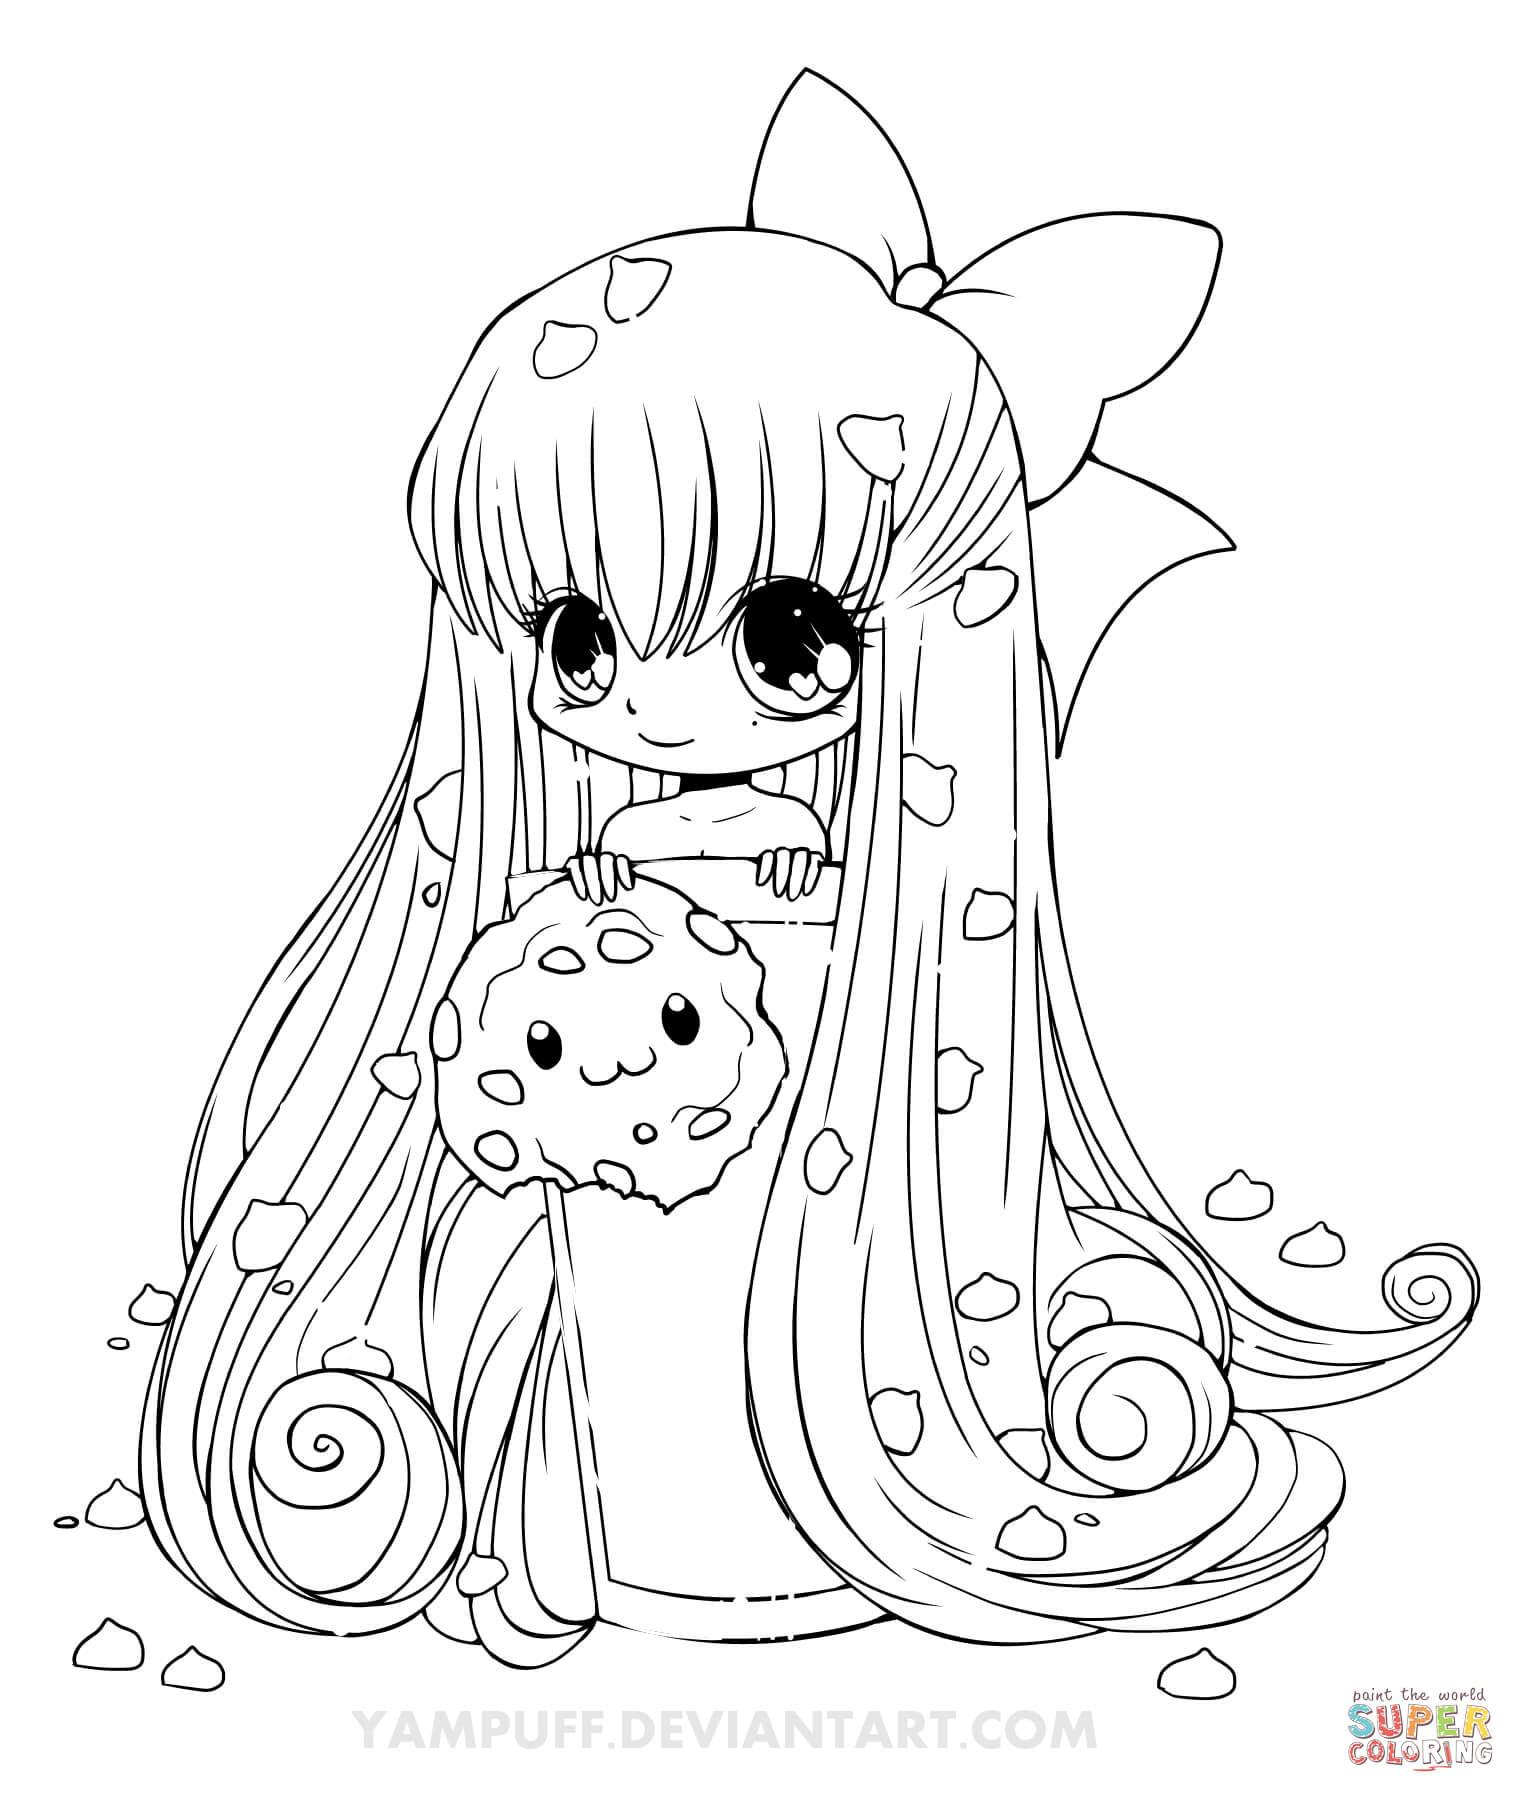 Chibi Girl Coloring Pages  Dibujo de Chica Chibi con Galleta para colorear